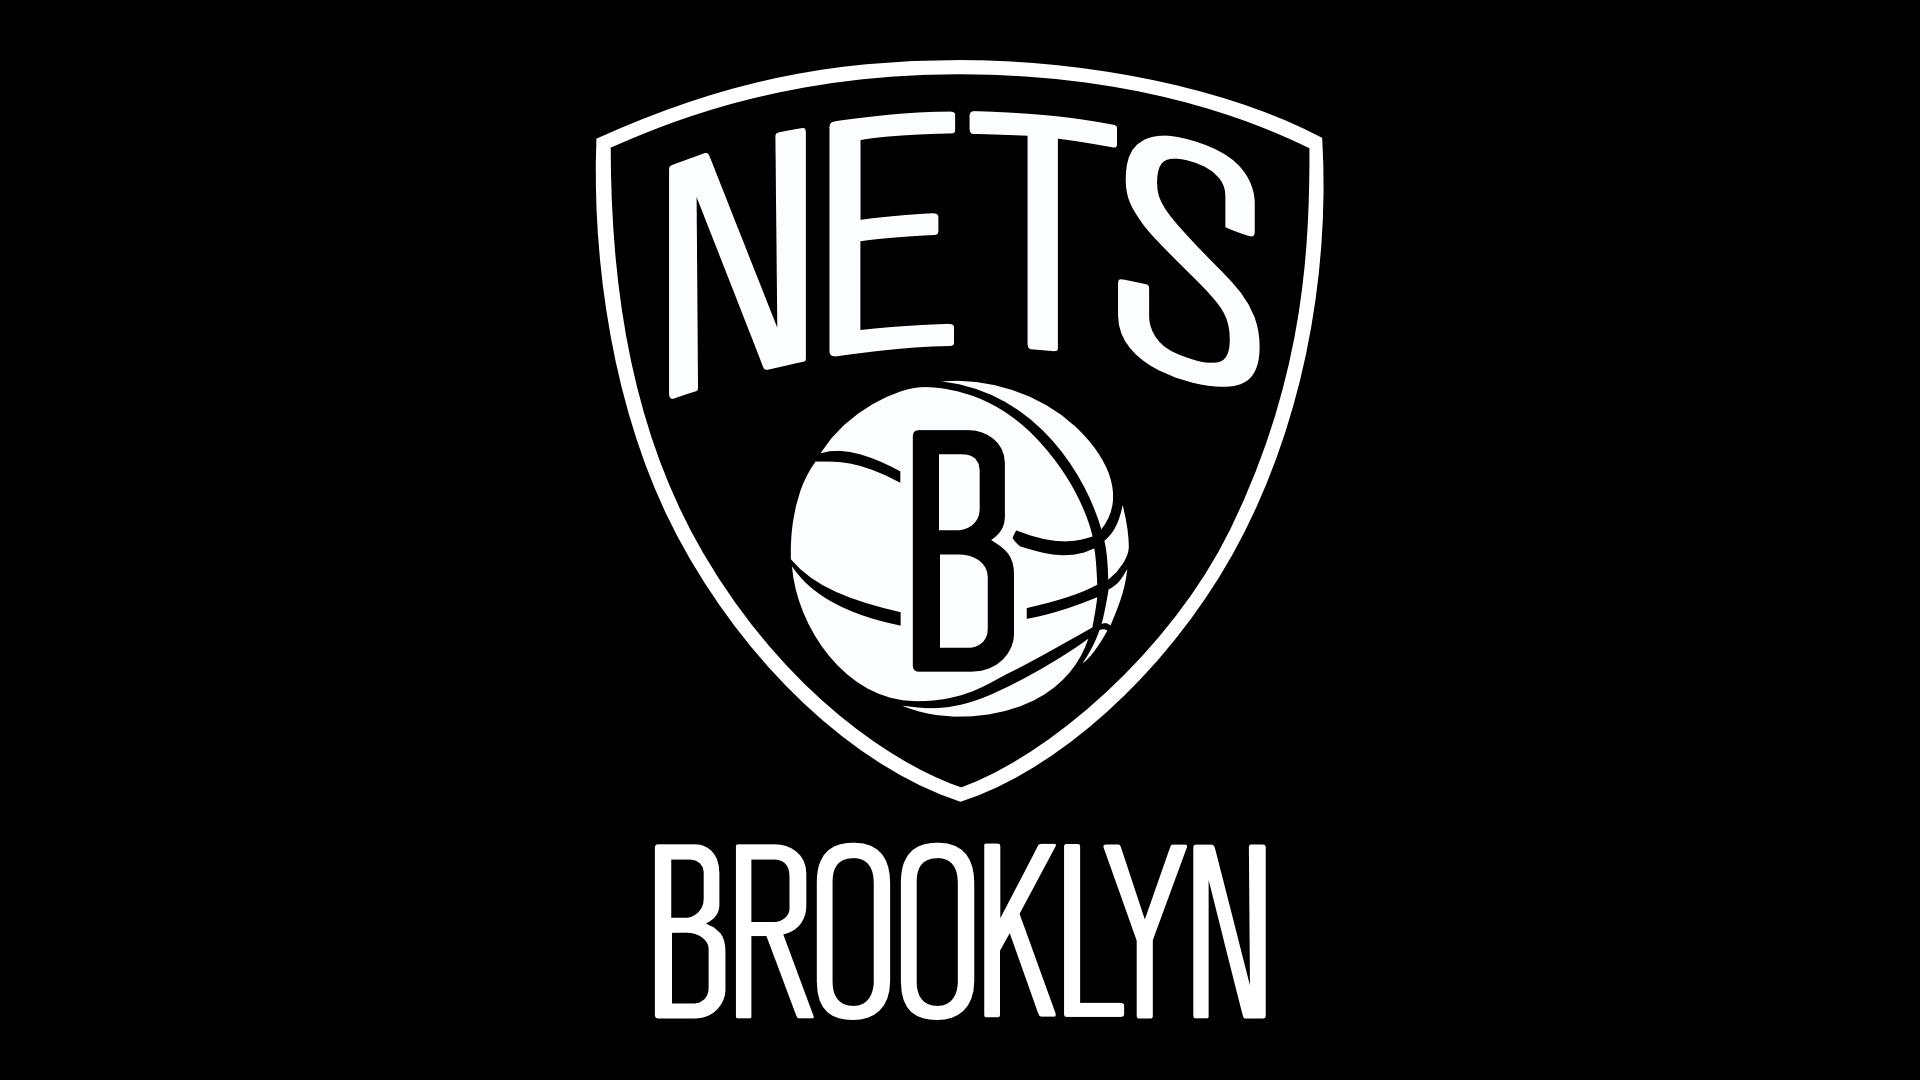 BROOKLYN NETS nba basketball (8) wallpaper   1920x1080 ...